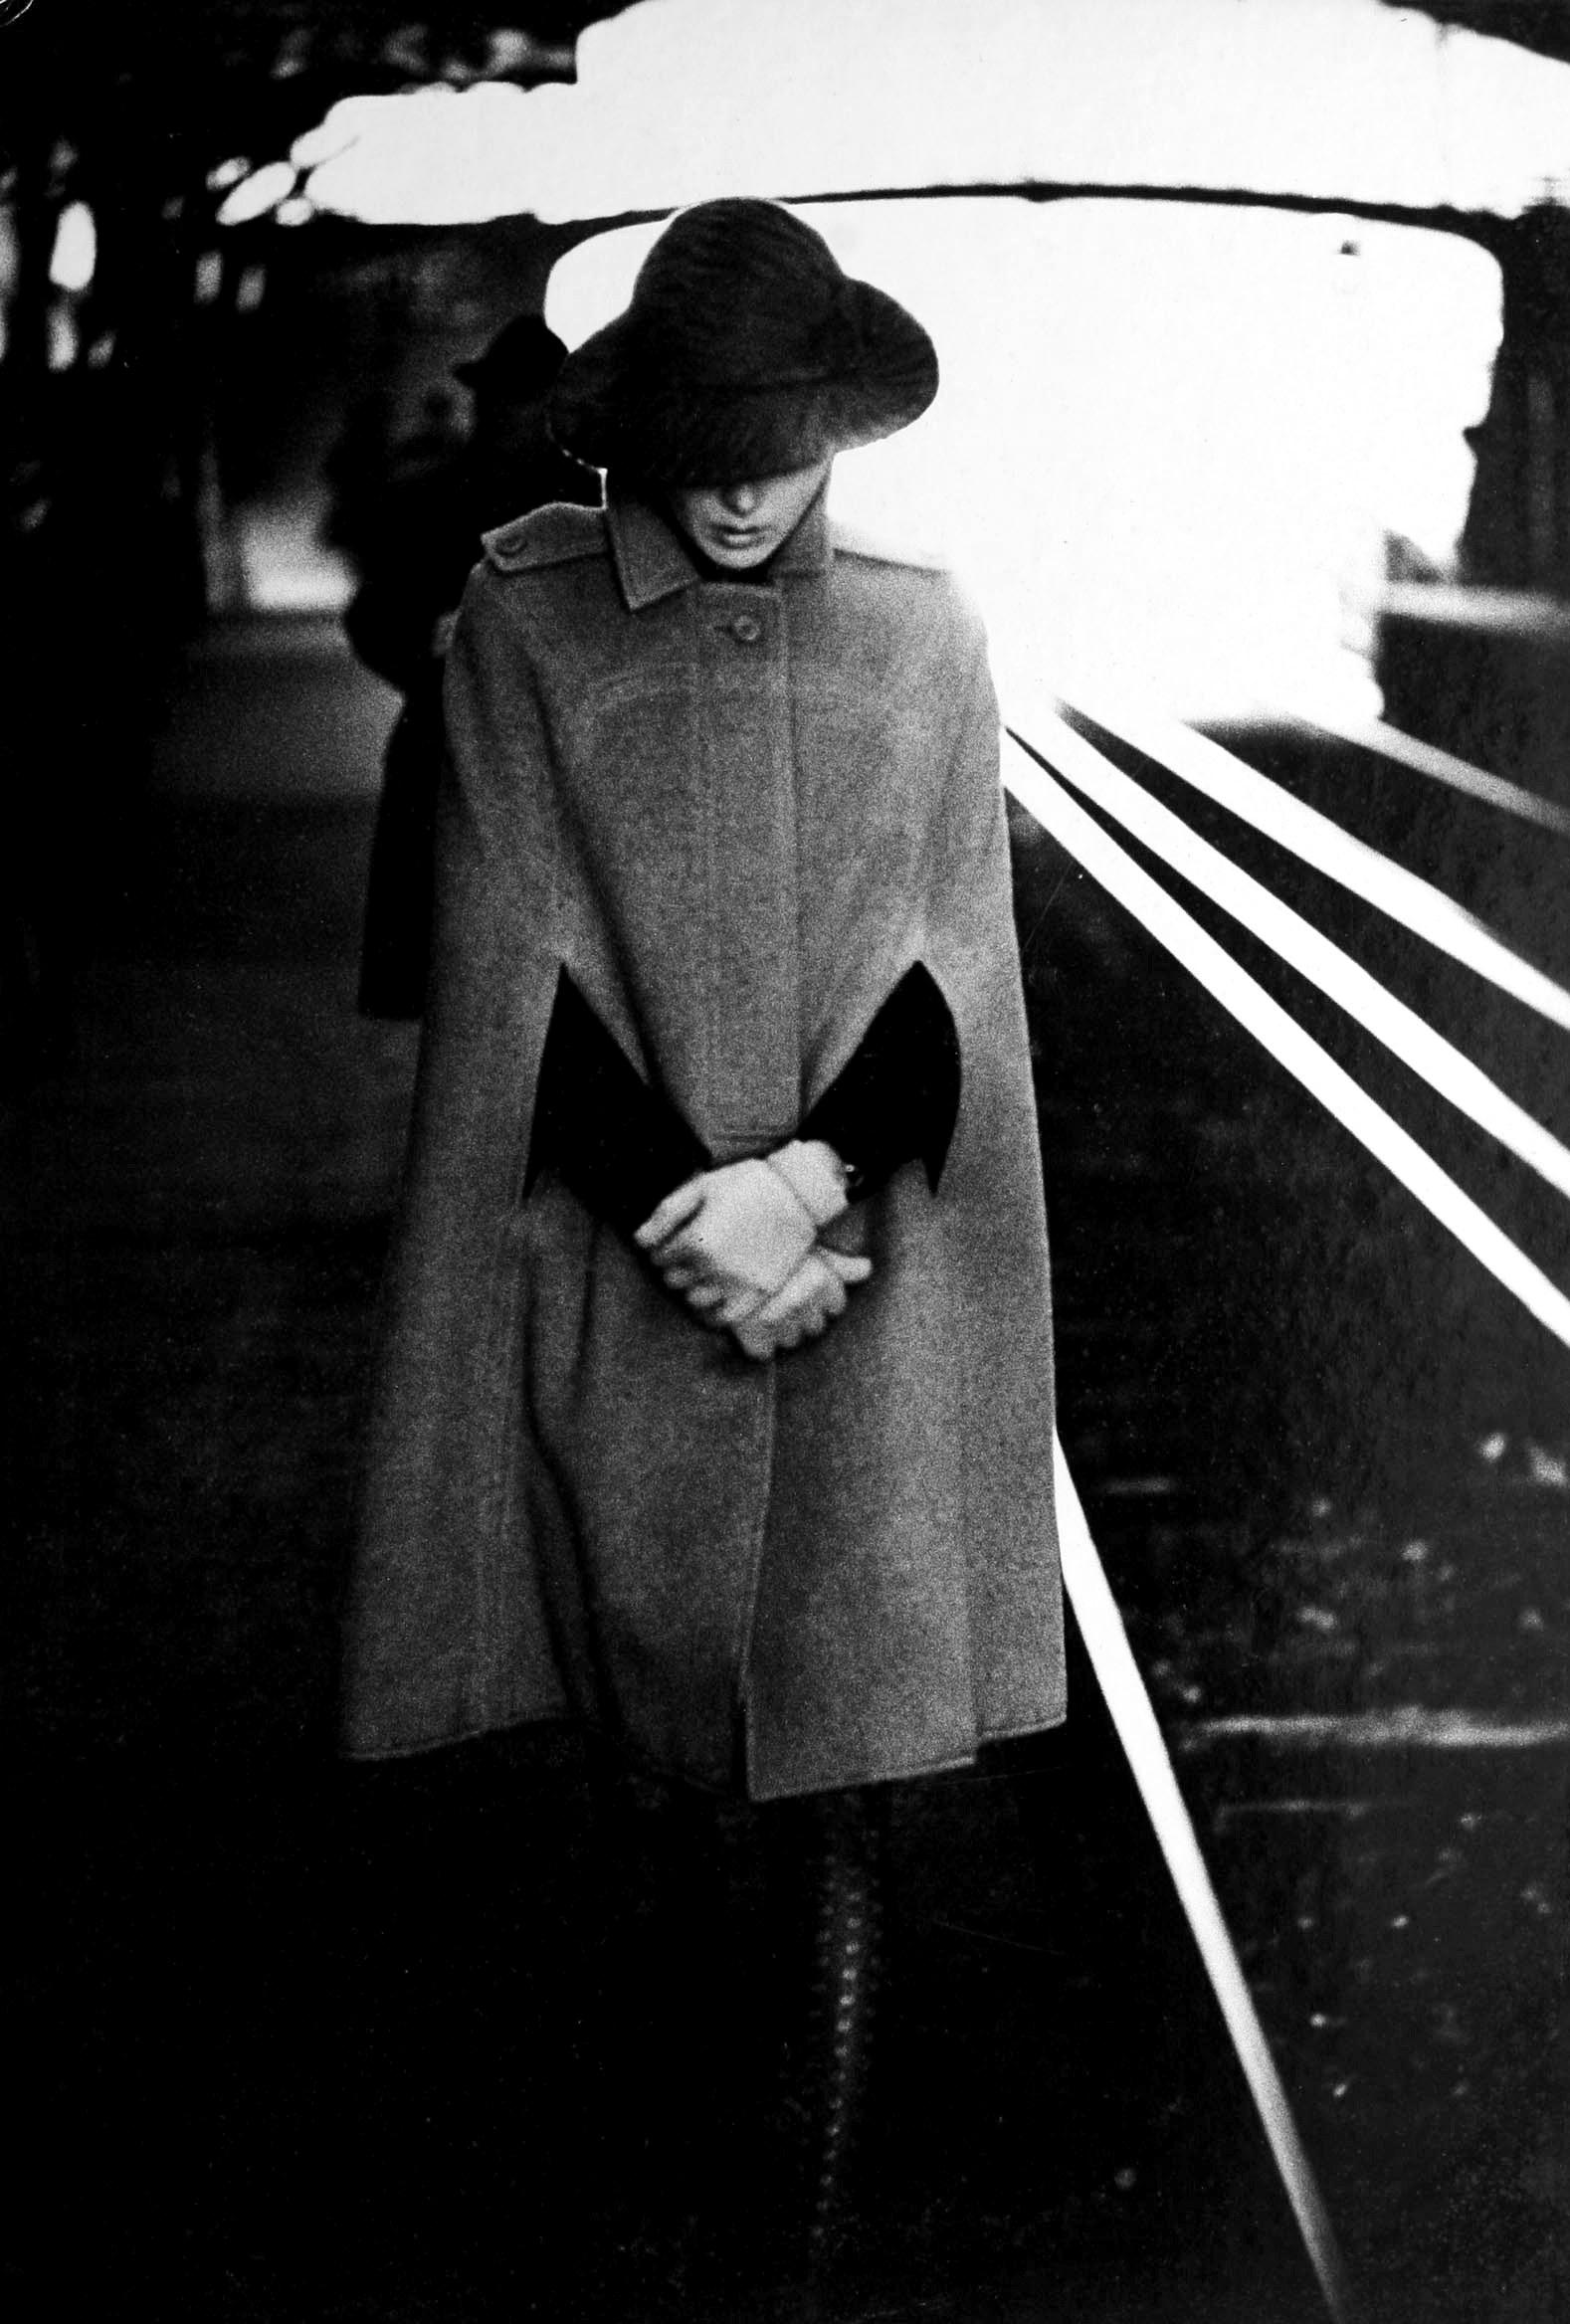 Ravageuses wear hats. | Jean-Fr - lesravageurs | ello